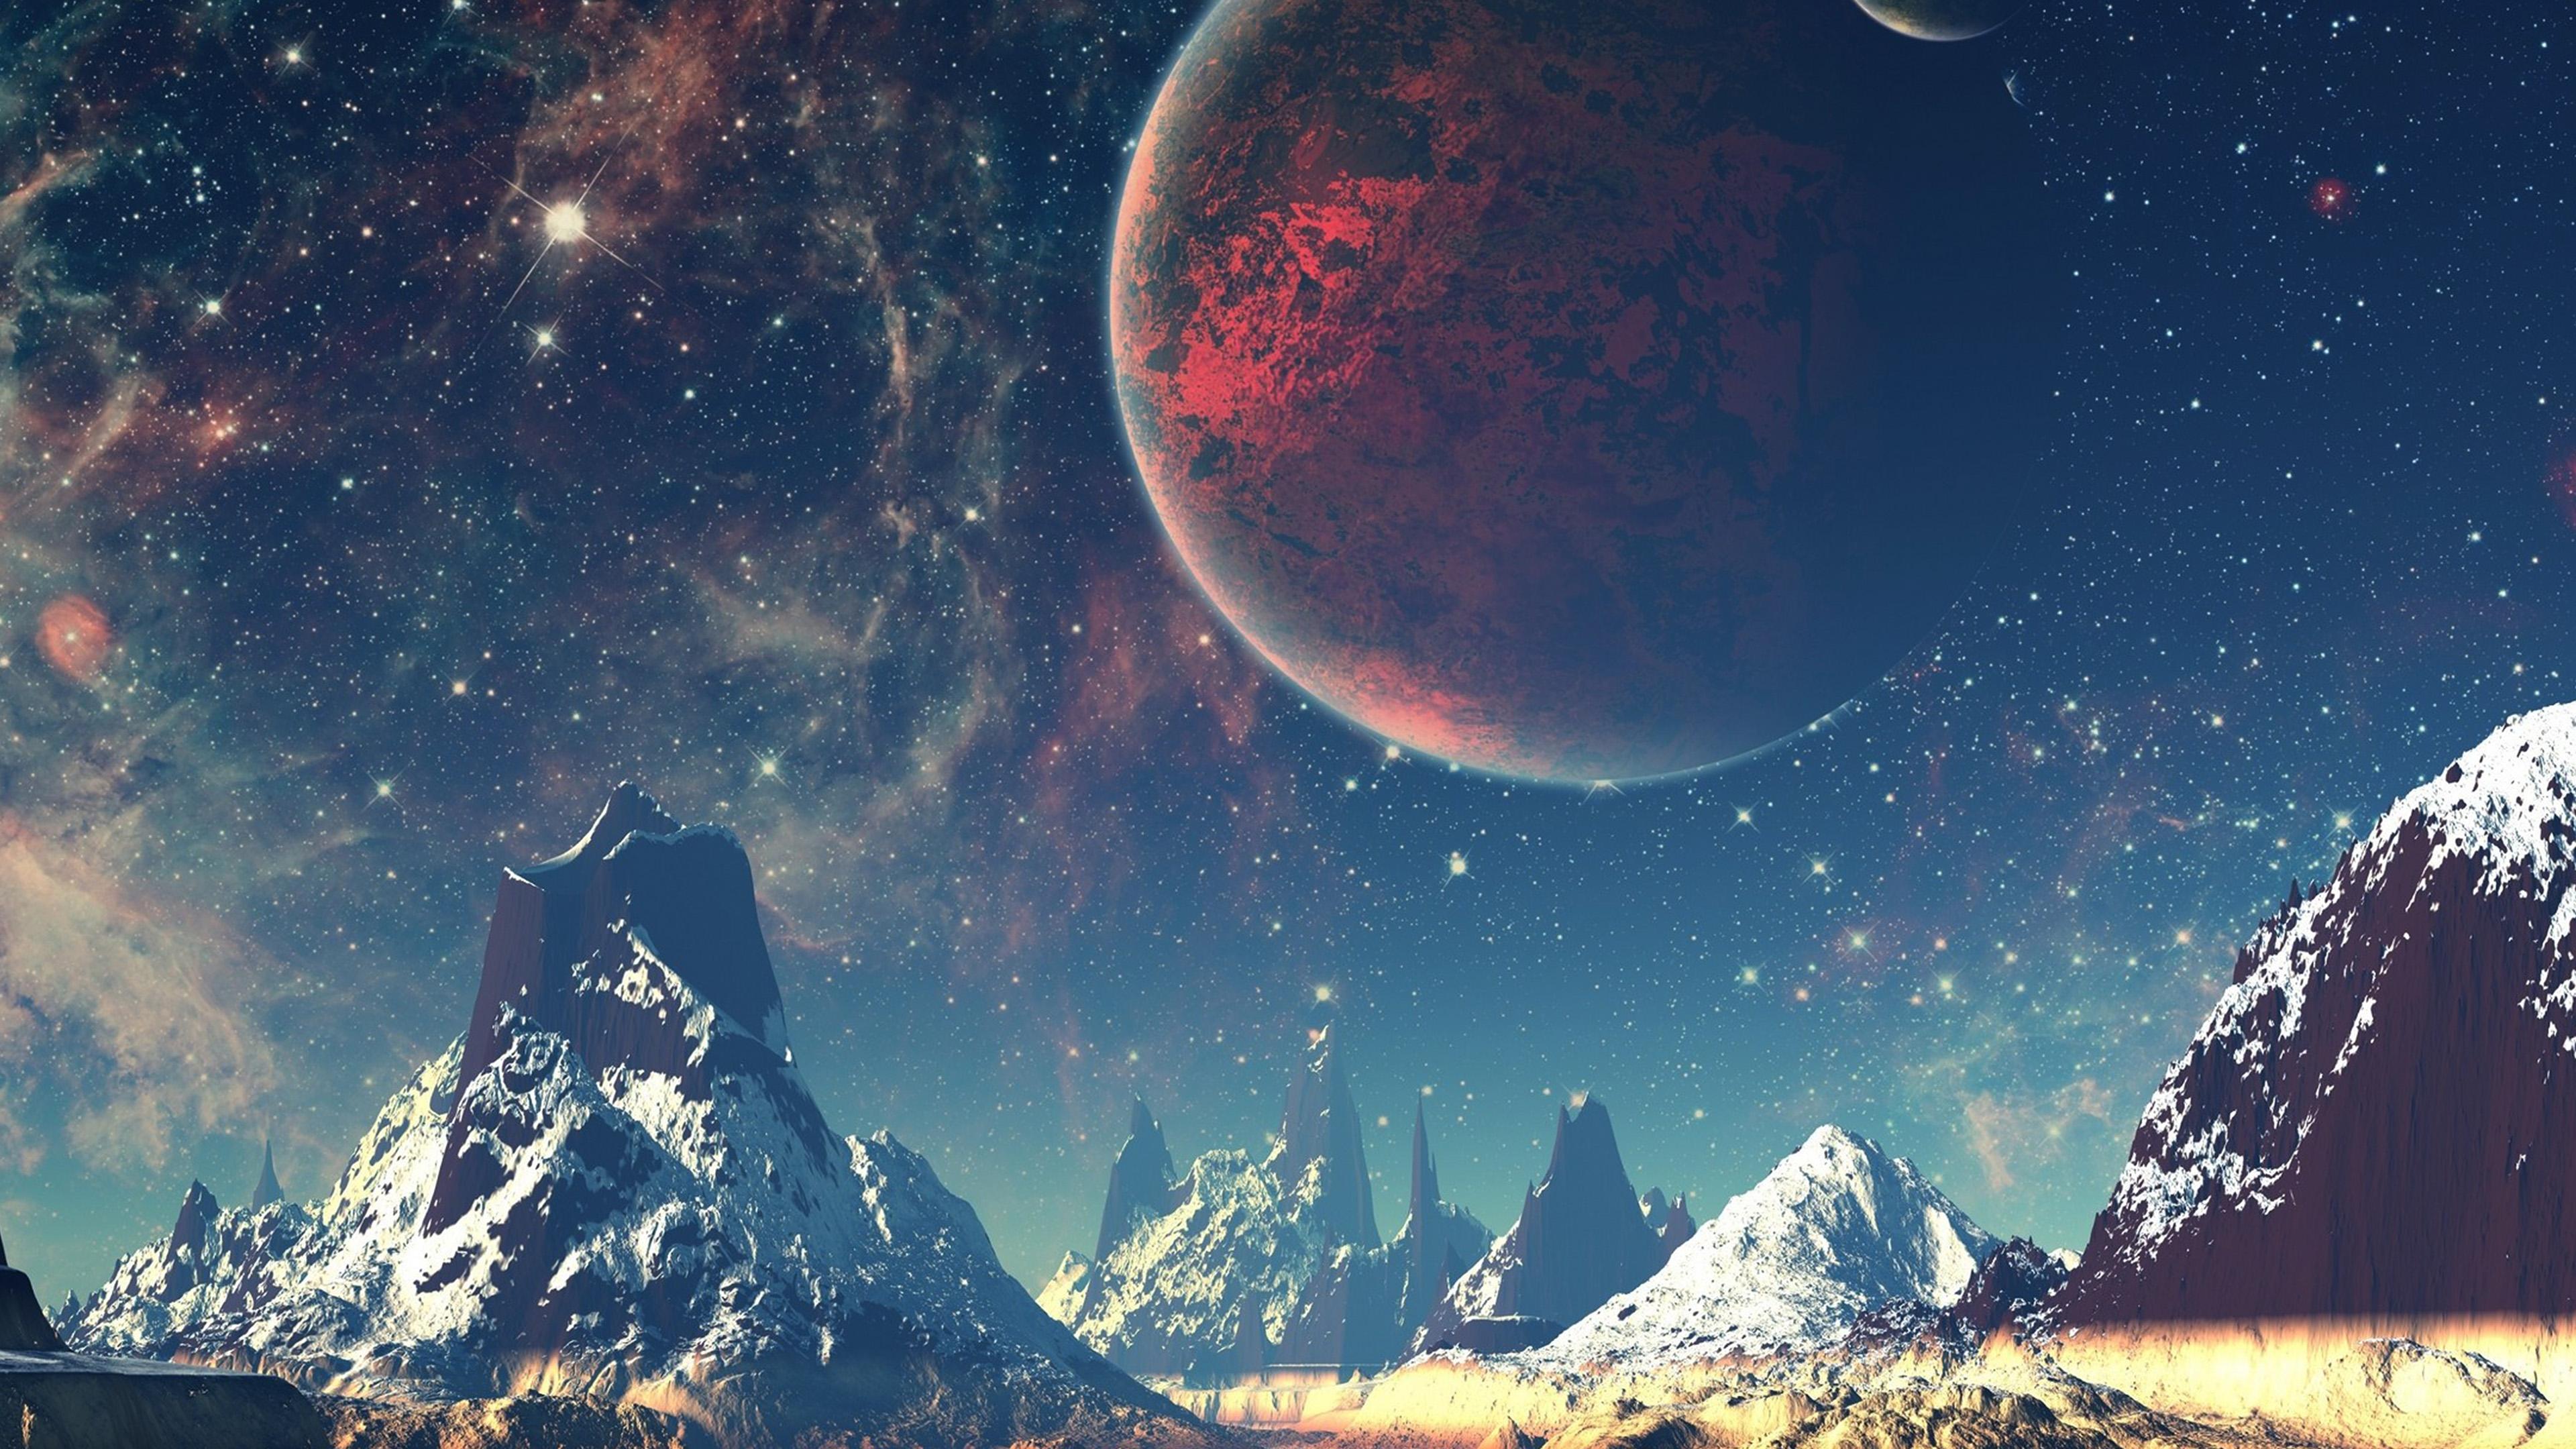 aq10-dream-space-world-mountain-sky-star-illustration